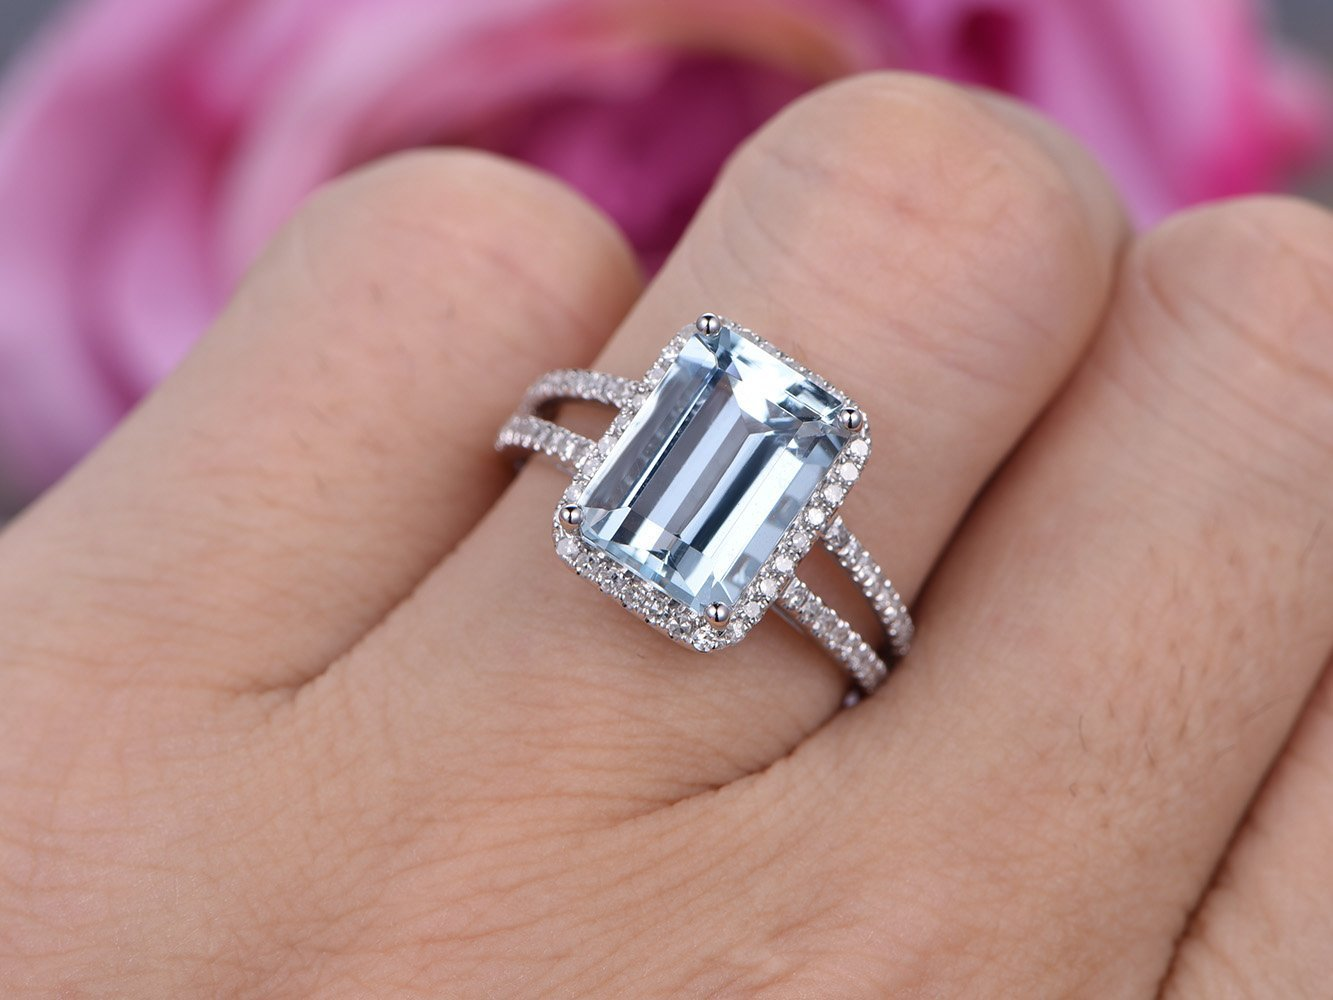 Amazon.com: Emerald Cut Aquamarine Engagement Ring Pave Diamond 14K ...